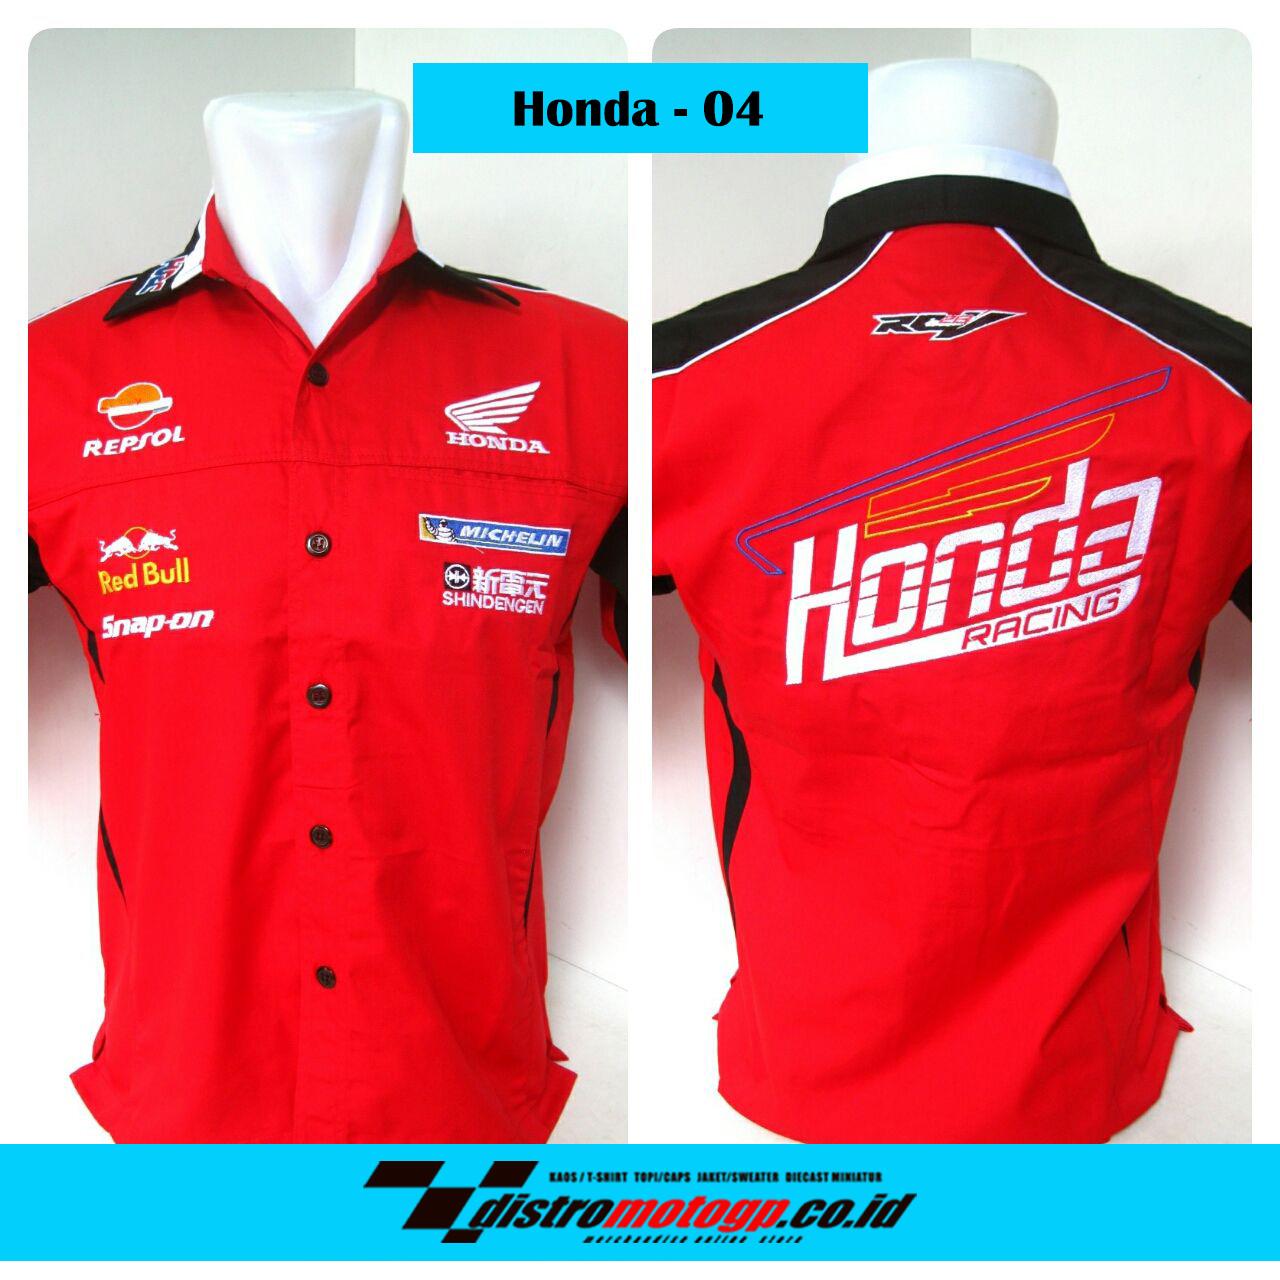 Kemeja Motogp Honda Racing Team 2017 04 Distro Kaos Topi Jaket Redbull Rp 145000